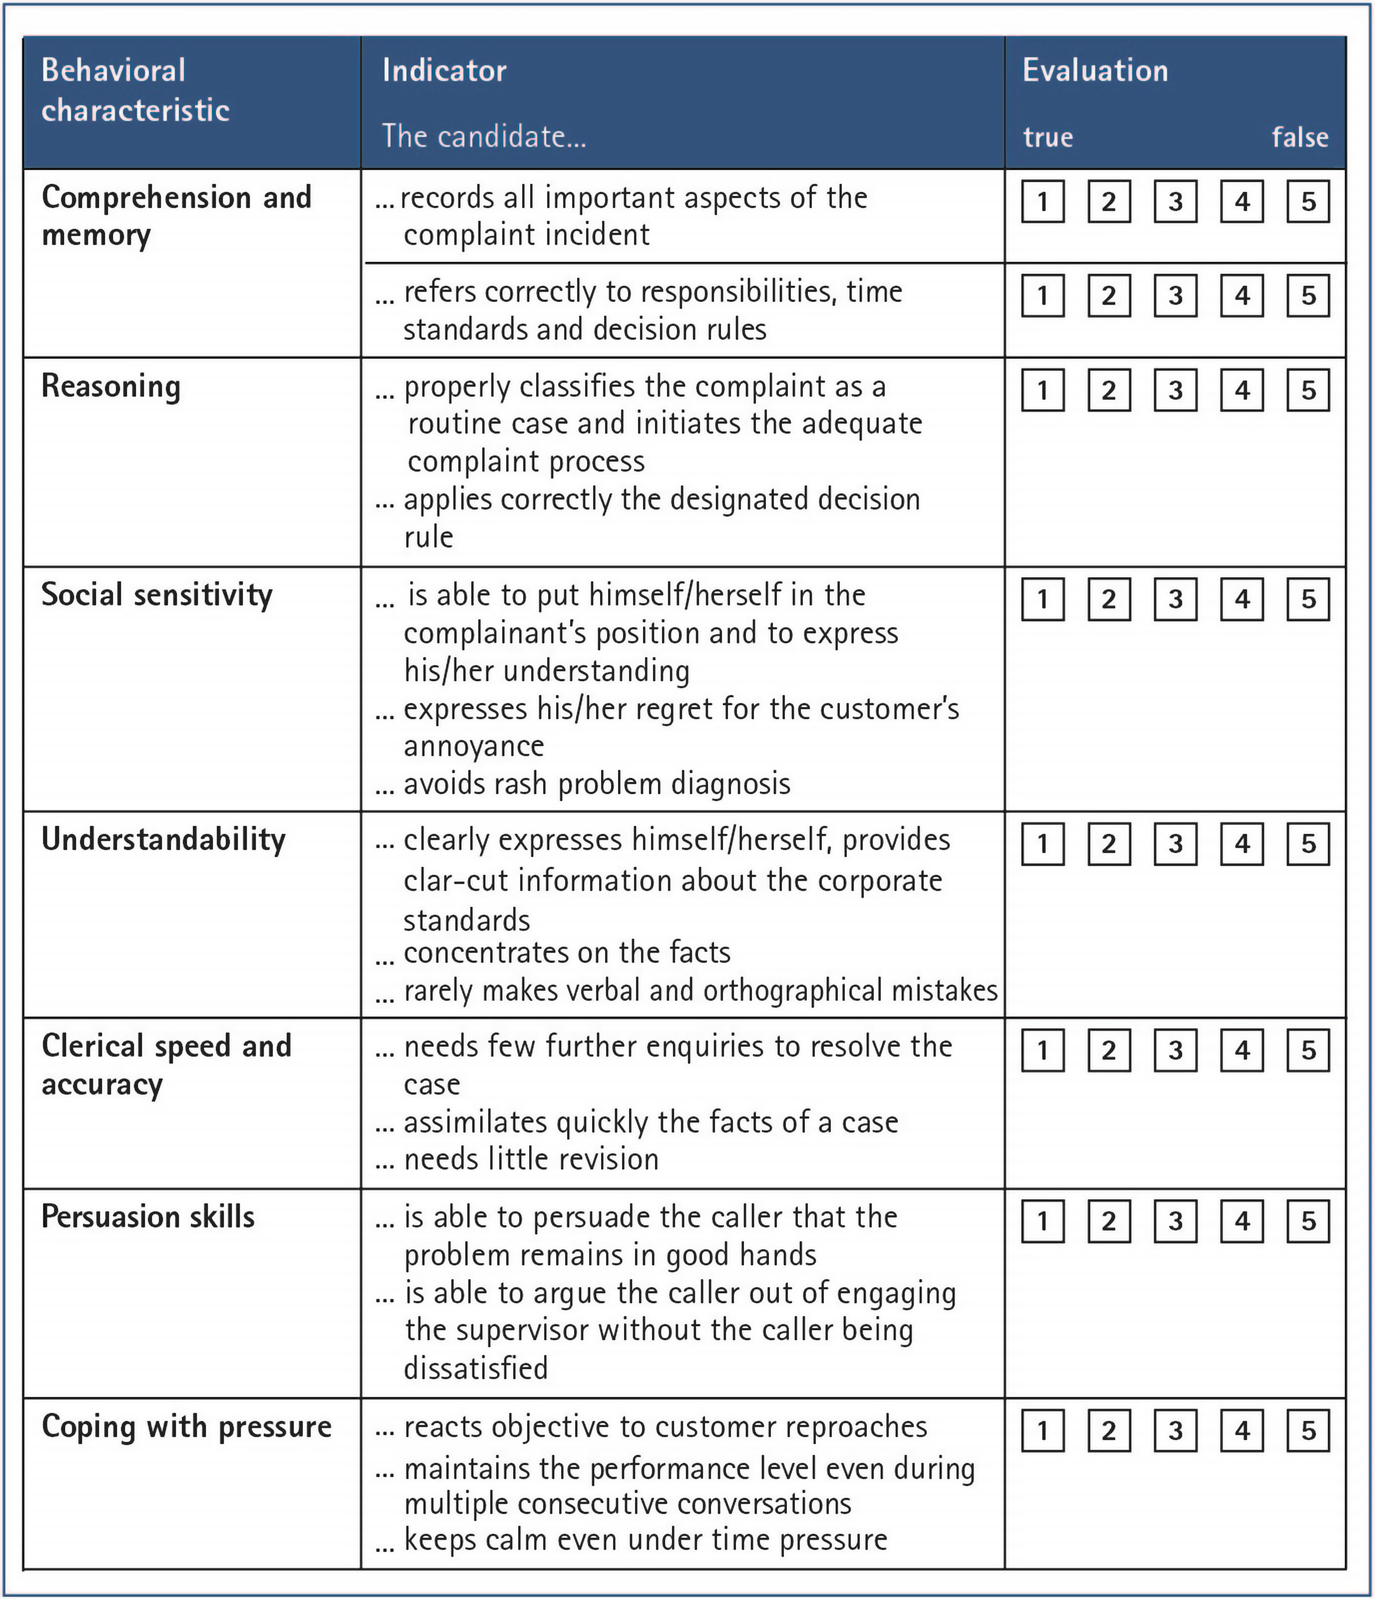 Human Resource Aspects of Complaint Management | SpringerLink